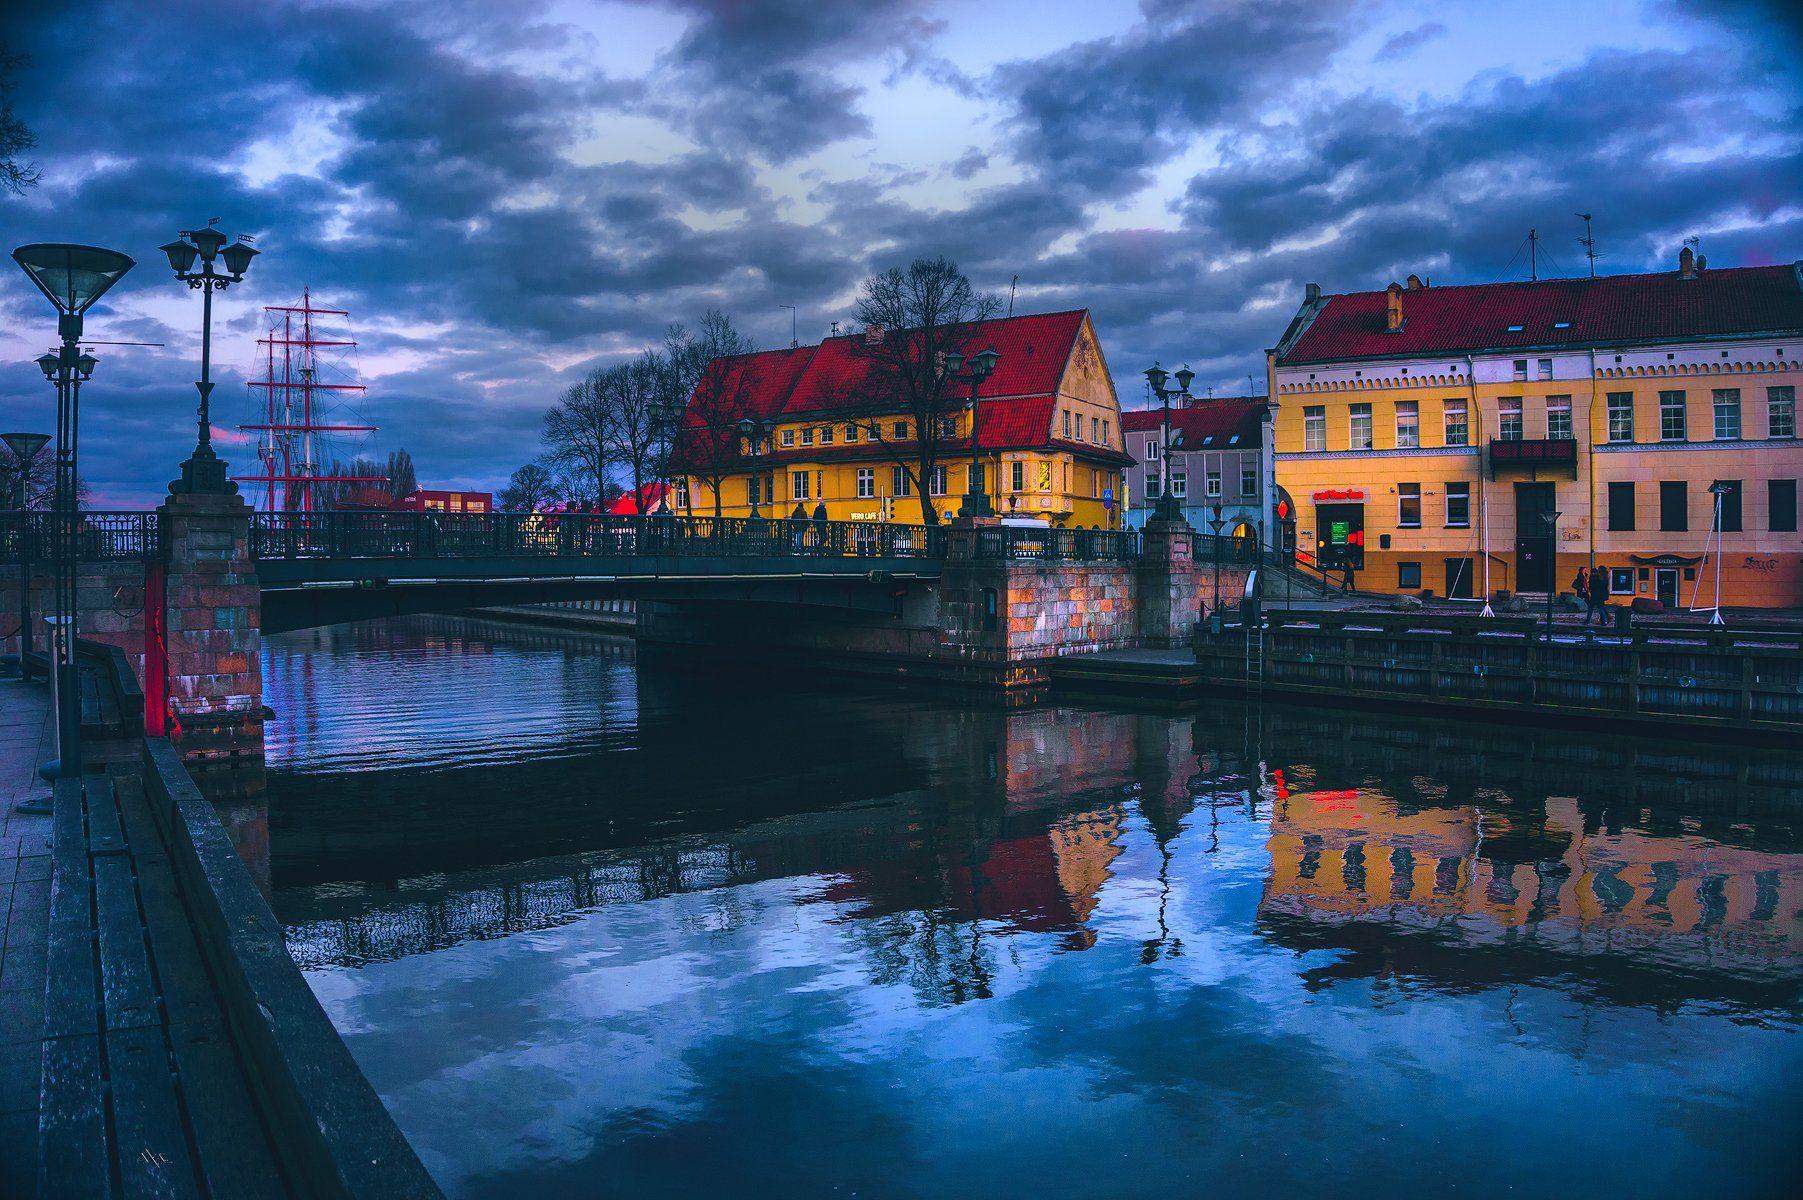 Evening, Klaipeda, Lithuania, Old city, Reflection, River, Руслан Болгов (Axe)